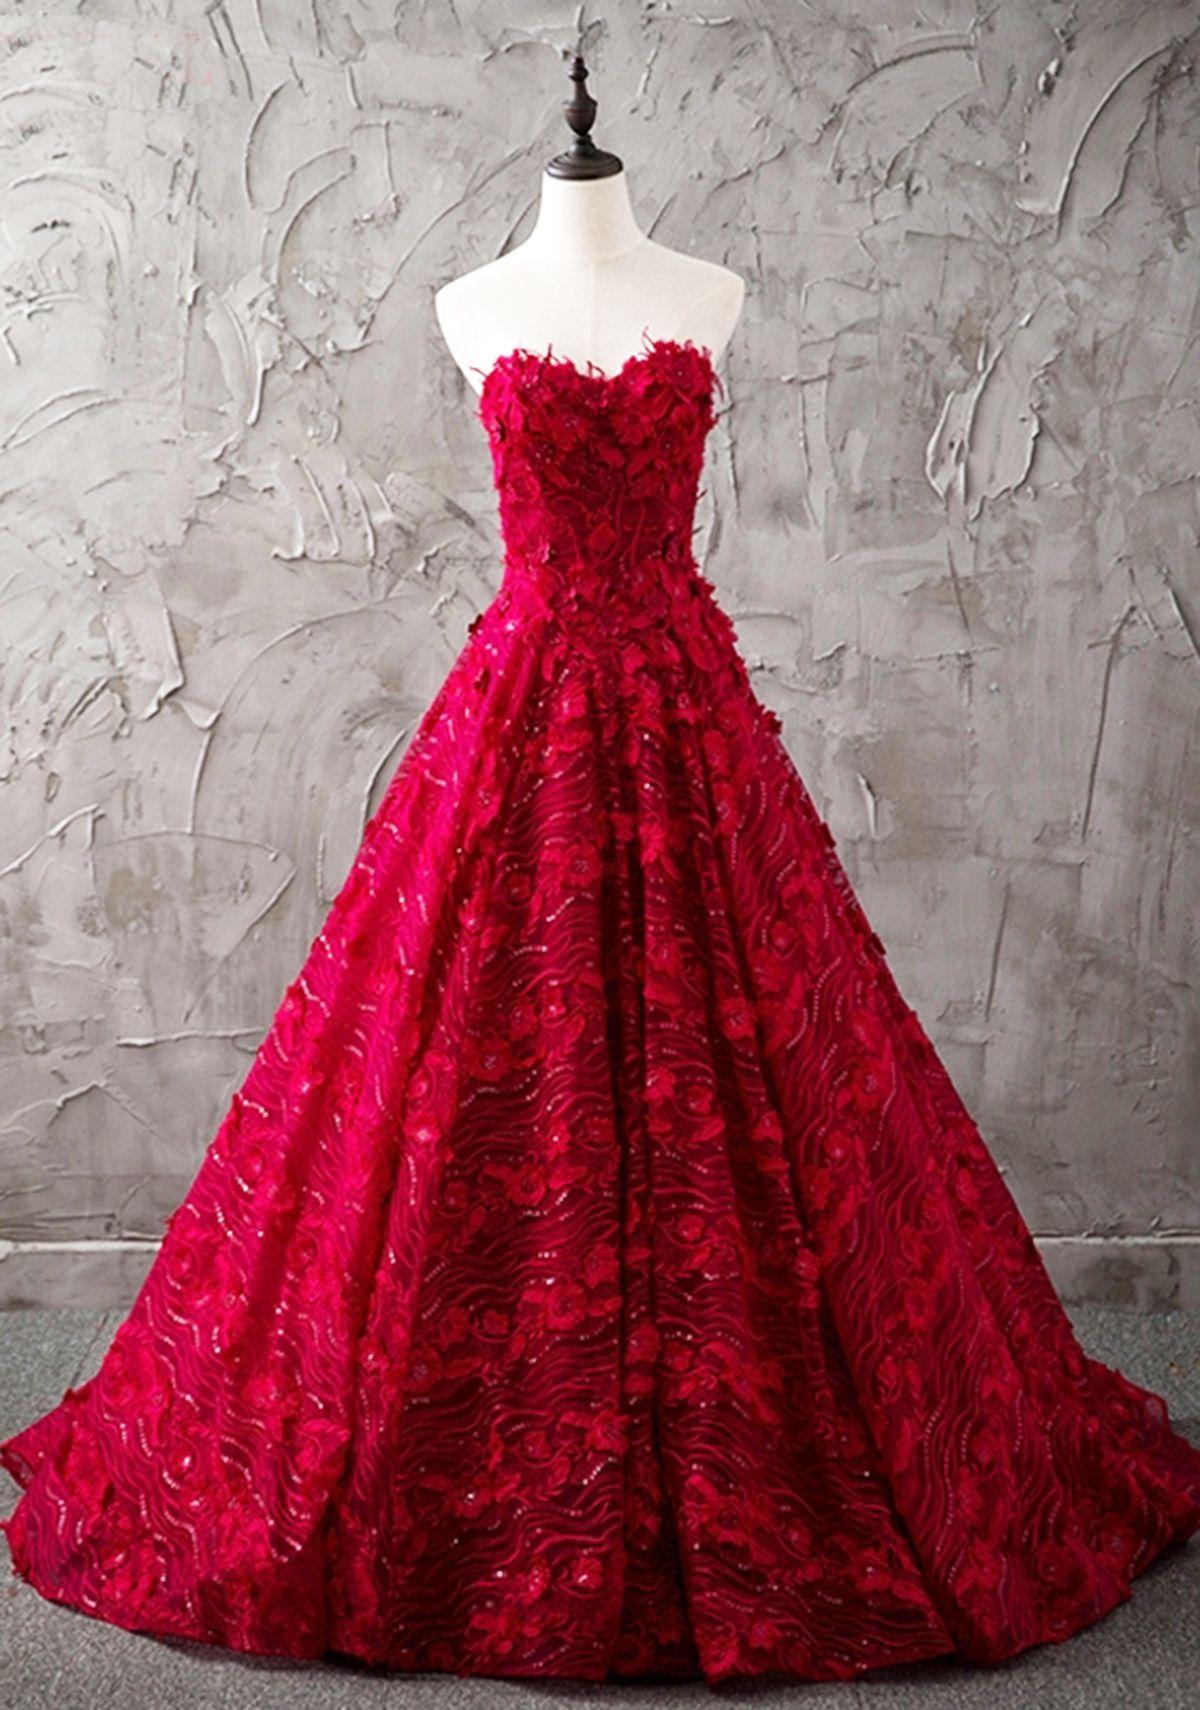 Burgundy lace strapless long formal evening dress 4504f327b6b1